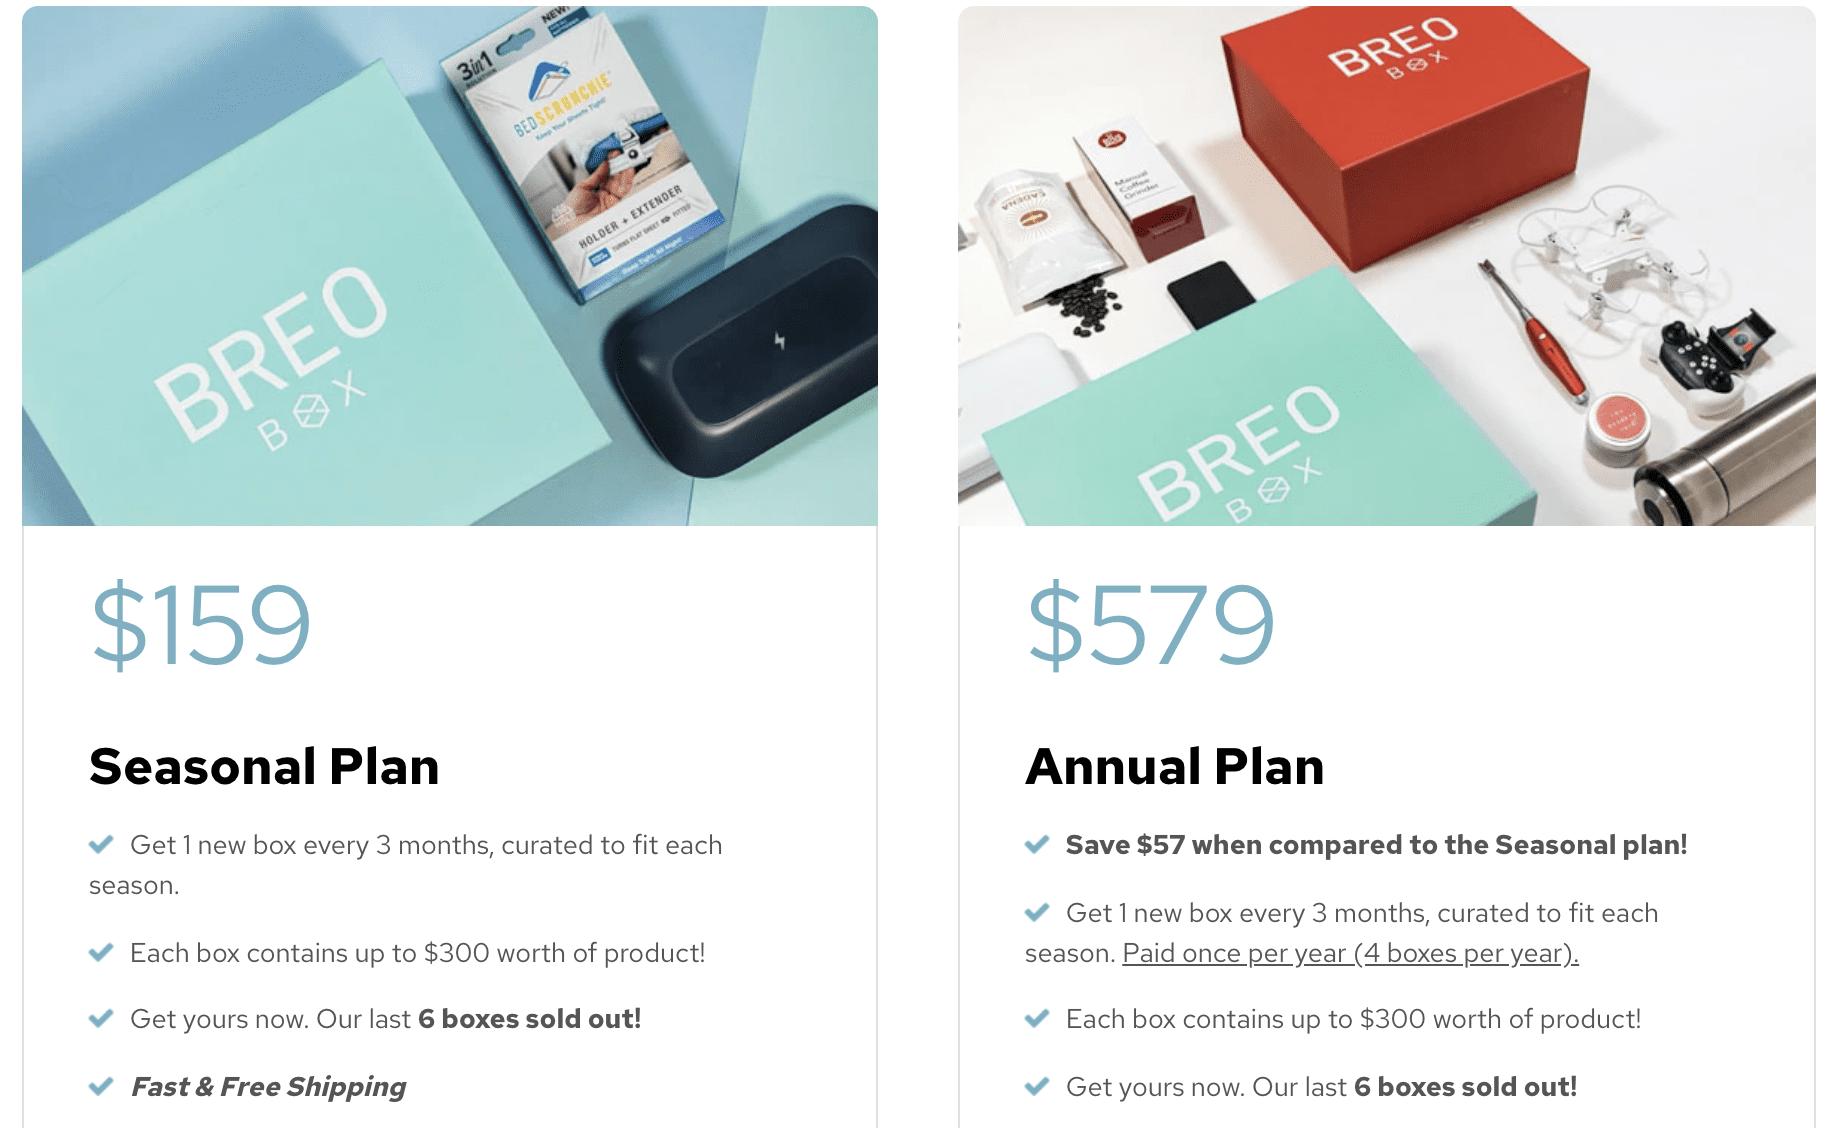 Breo Box subscription plans